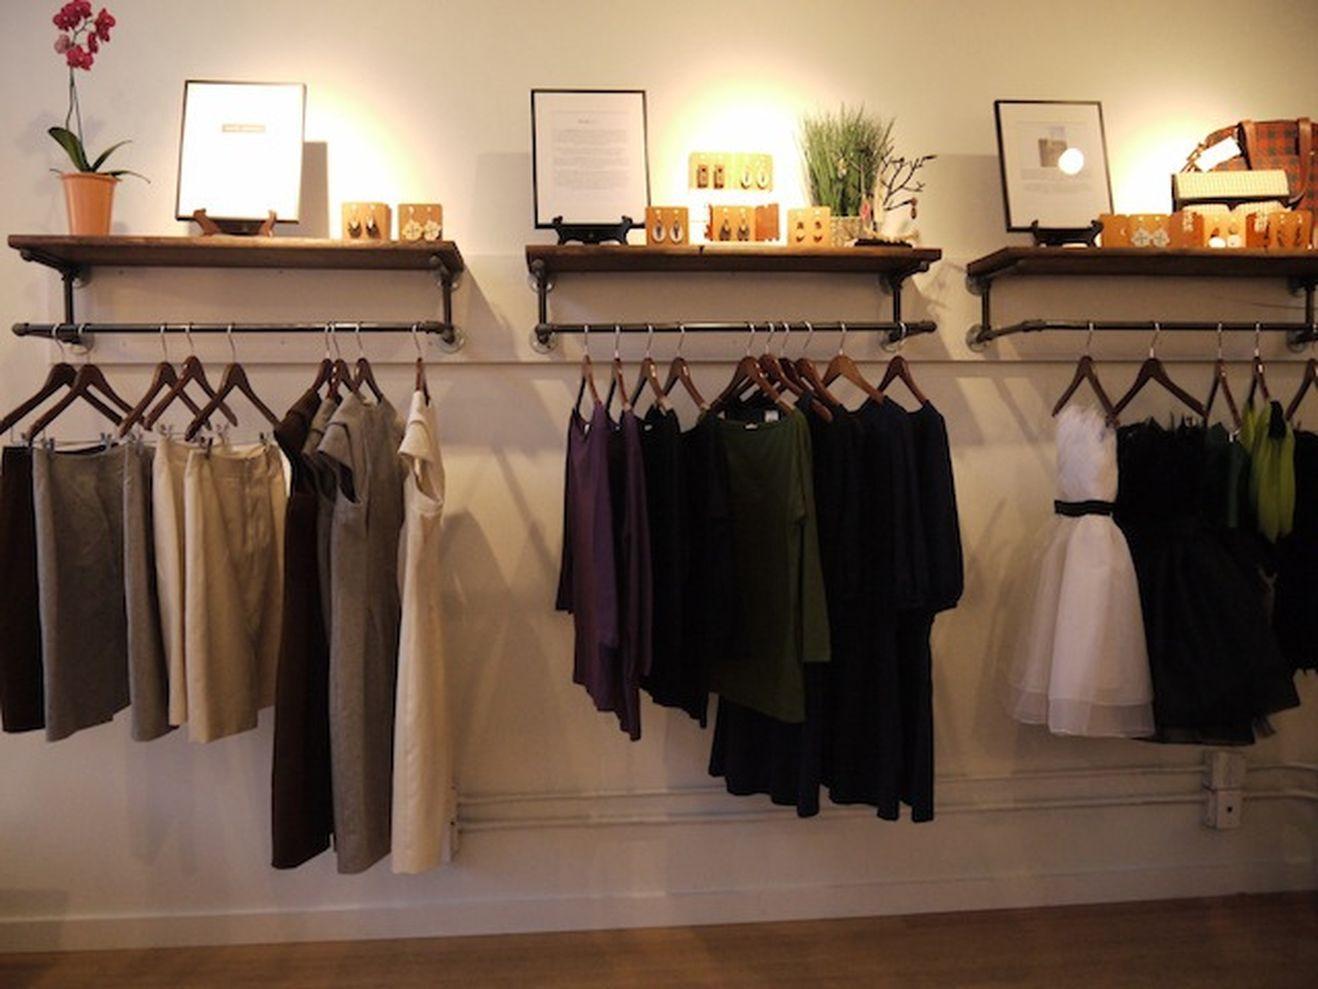 28 Easy Diy Hook Ideas For Multifunctional Needs Rangement Vetement Dressing Maison Placard A Vetements